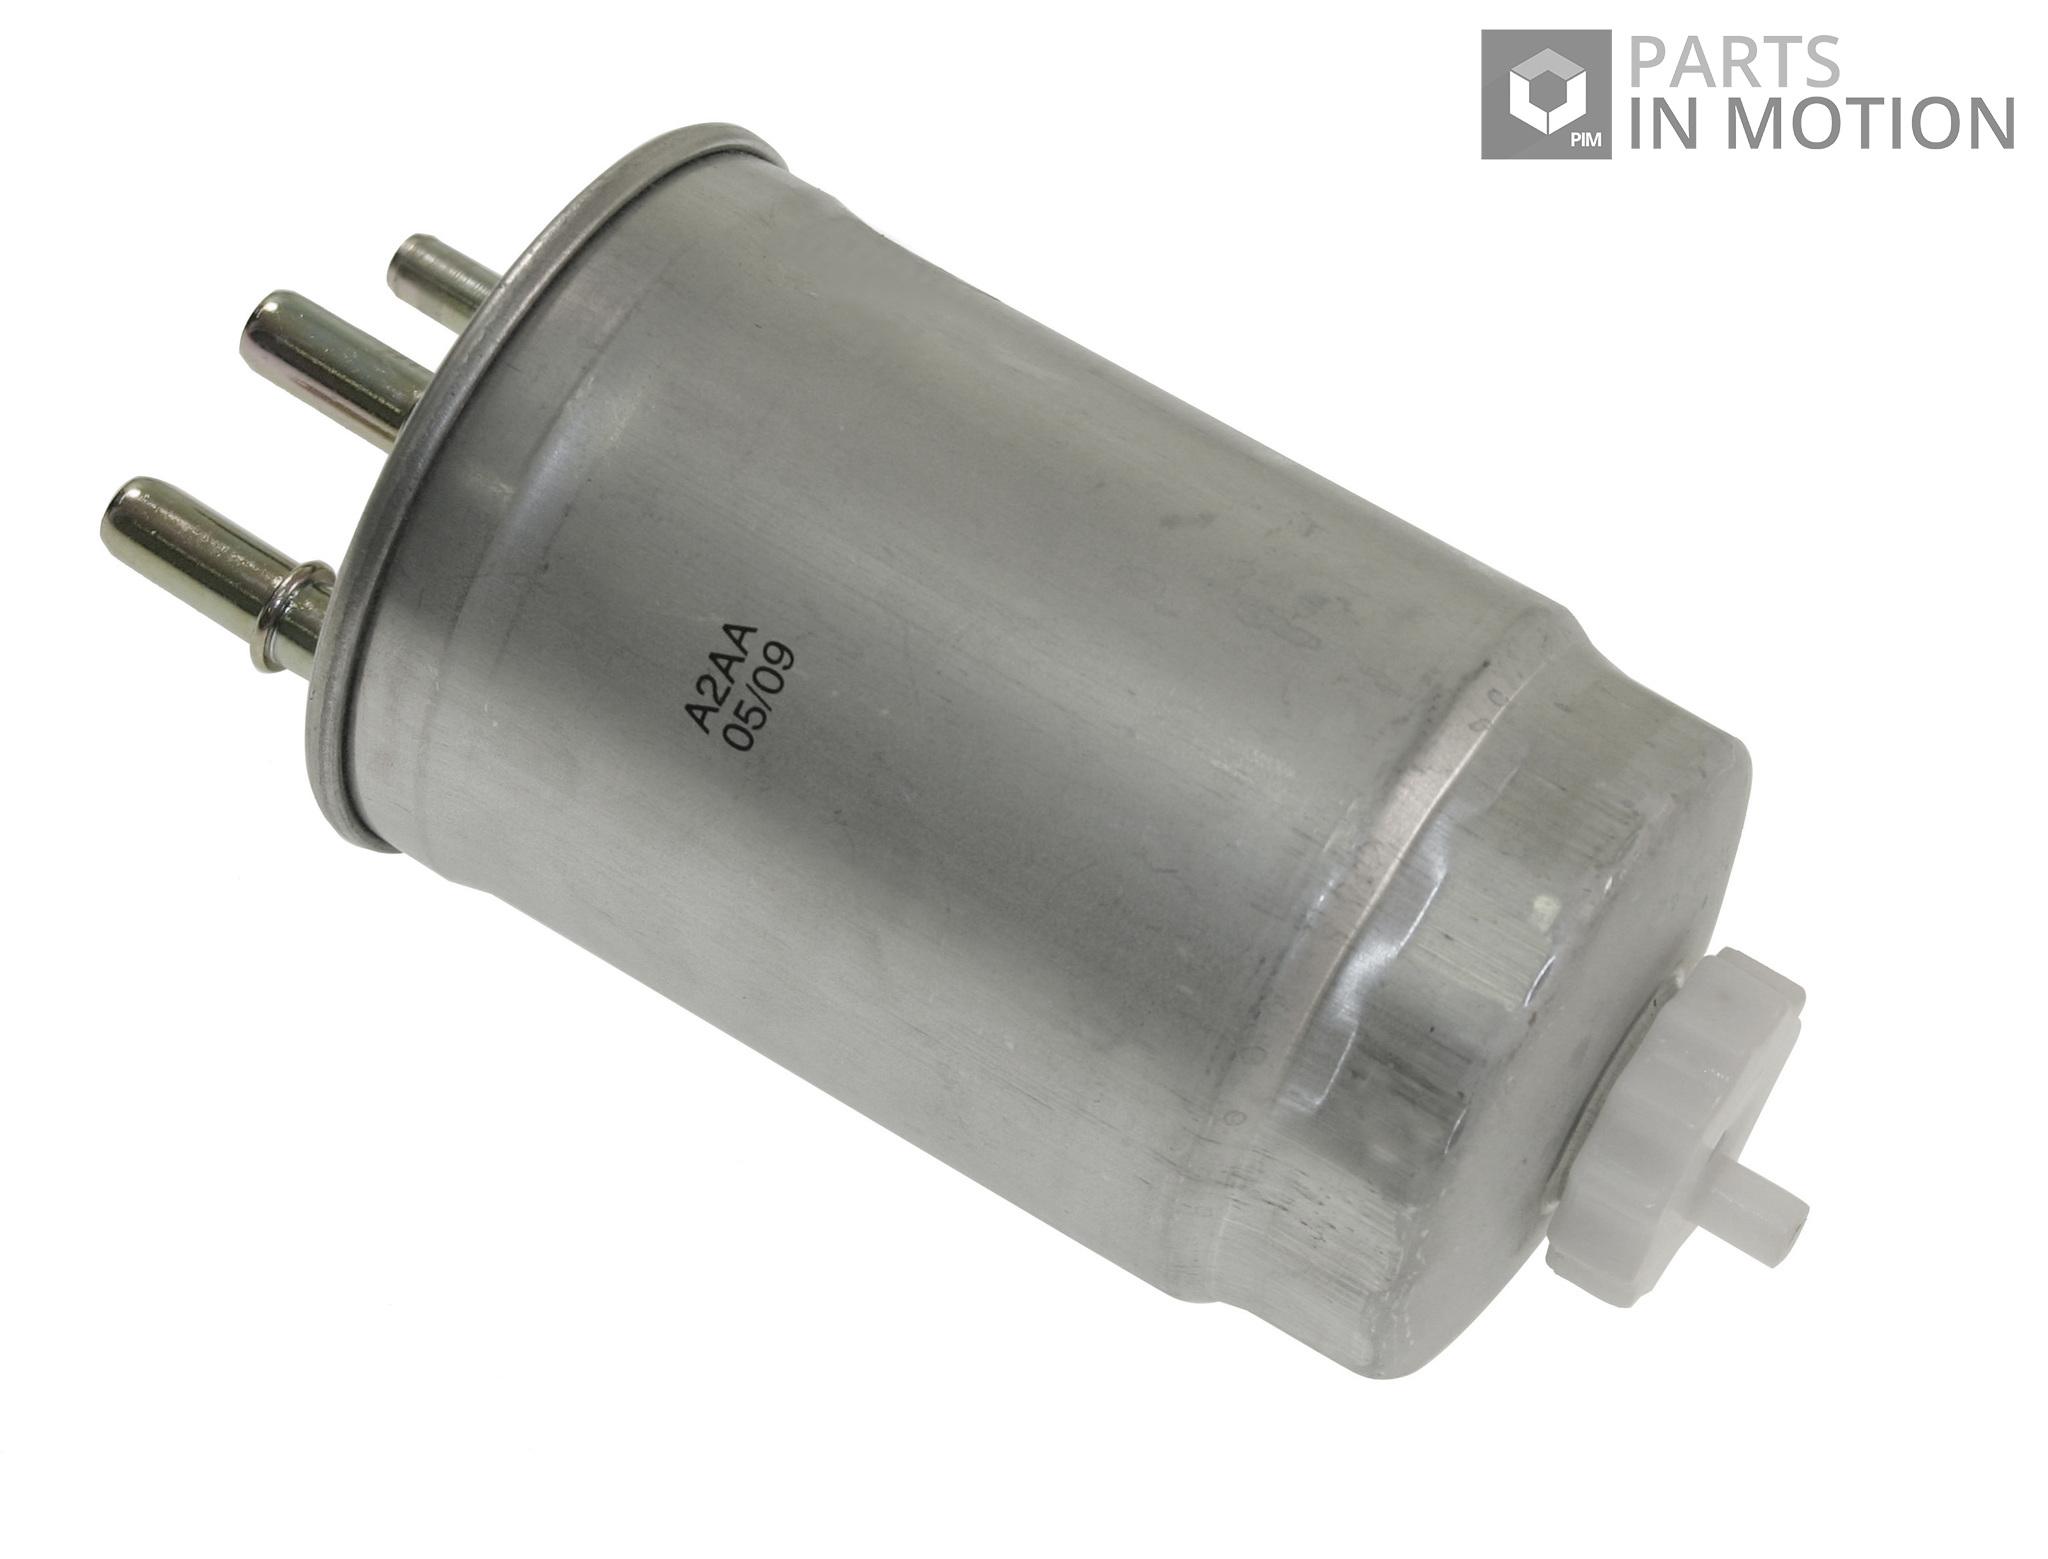 Fuel Filter Fits Kia Sedona 2 9d 06 To 09 Adg02342 Blue